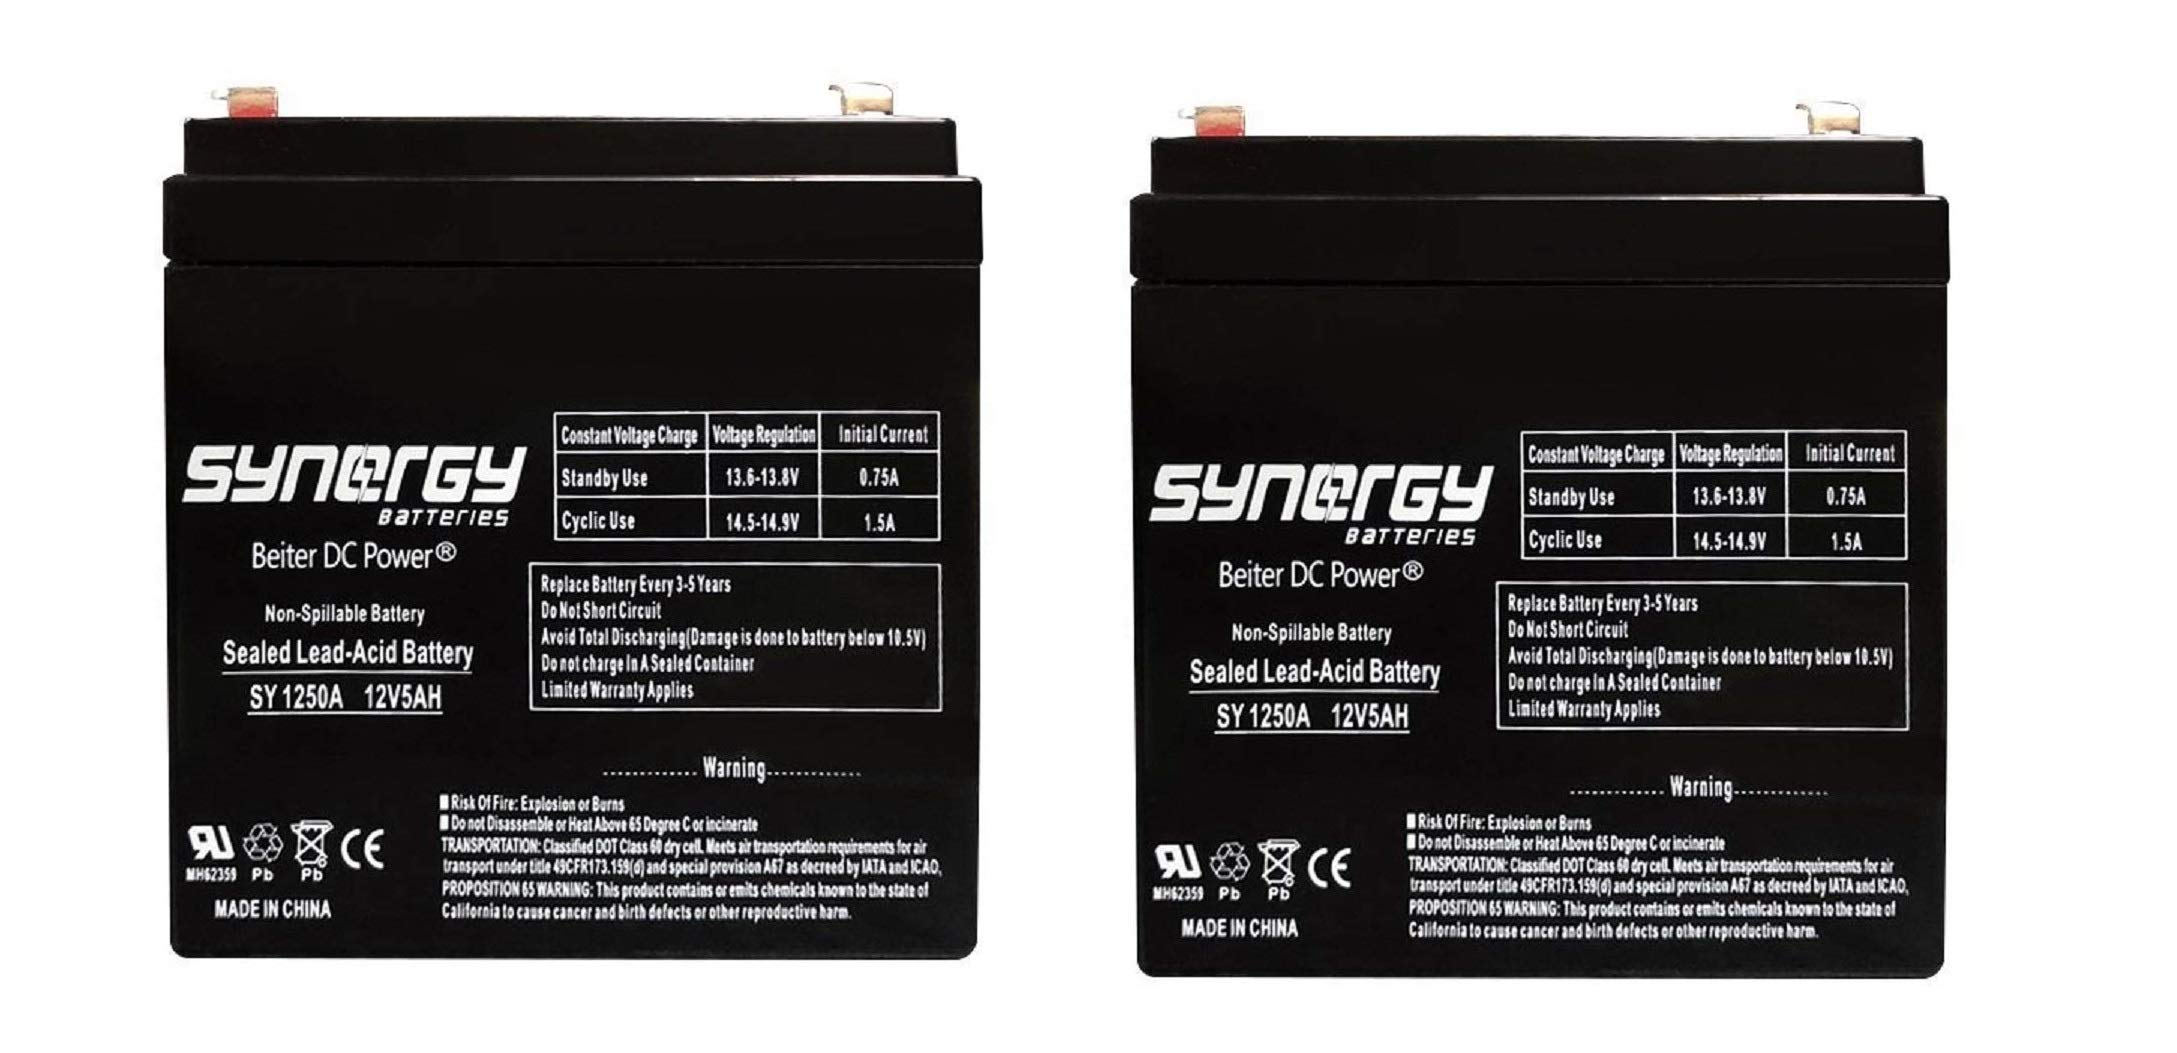 Razor E100 E125 E150 Electric Scooter battery 12V 5AH - 2 Pack (PK1250) by Beiter DC Power